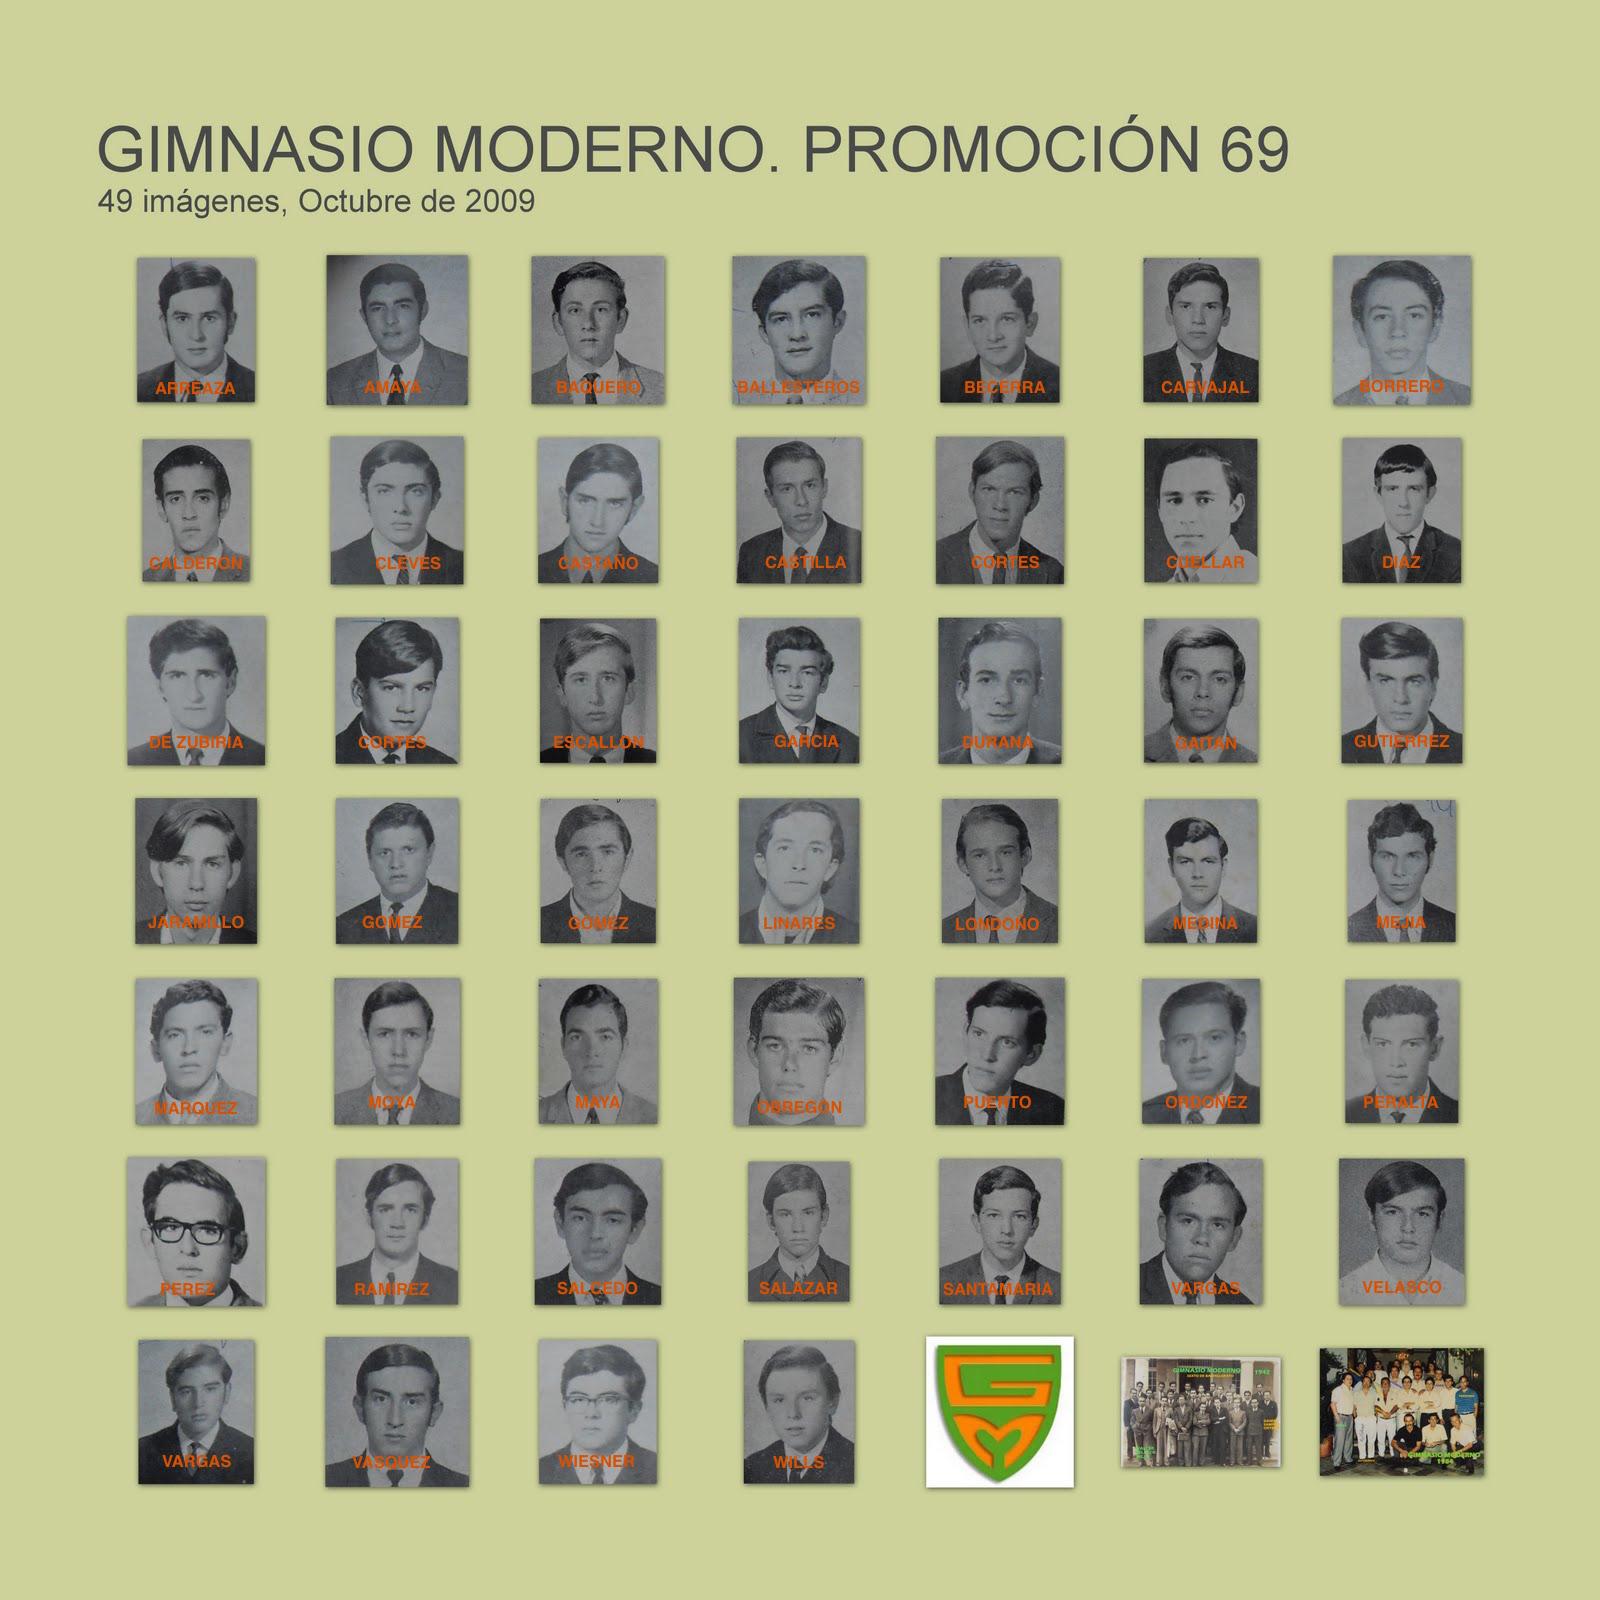 Gimnasio moderno clase del 69 for Gimnasio moderno